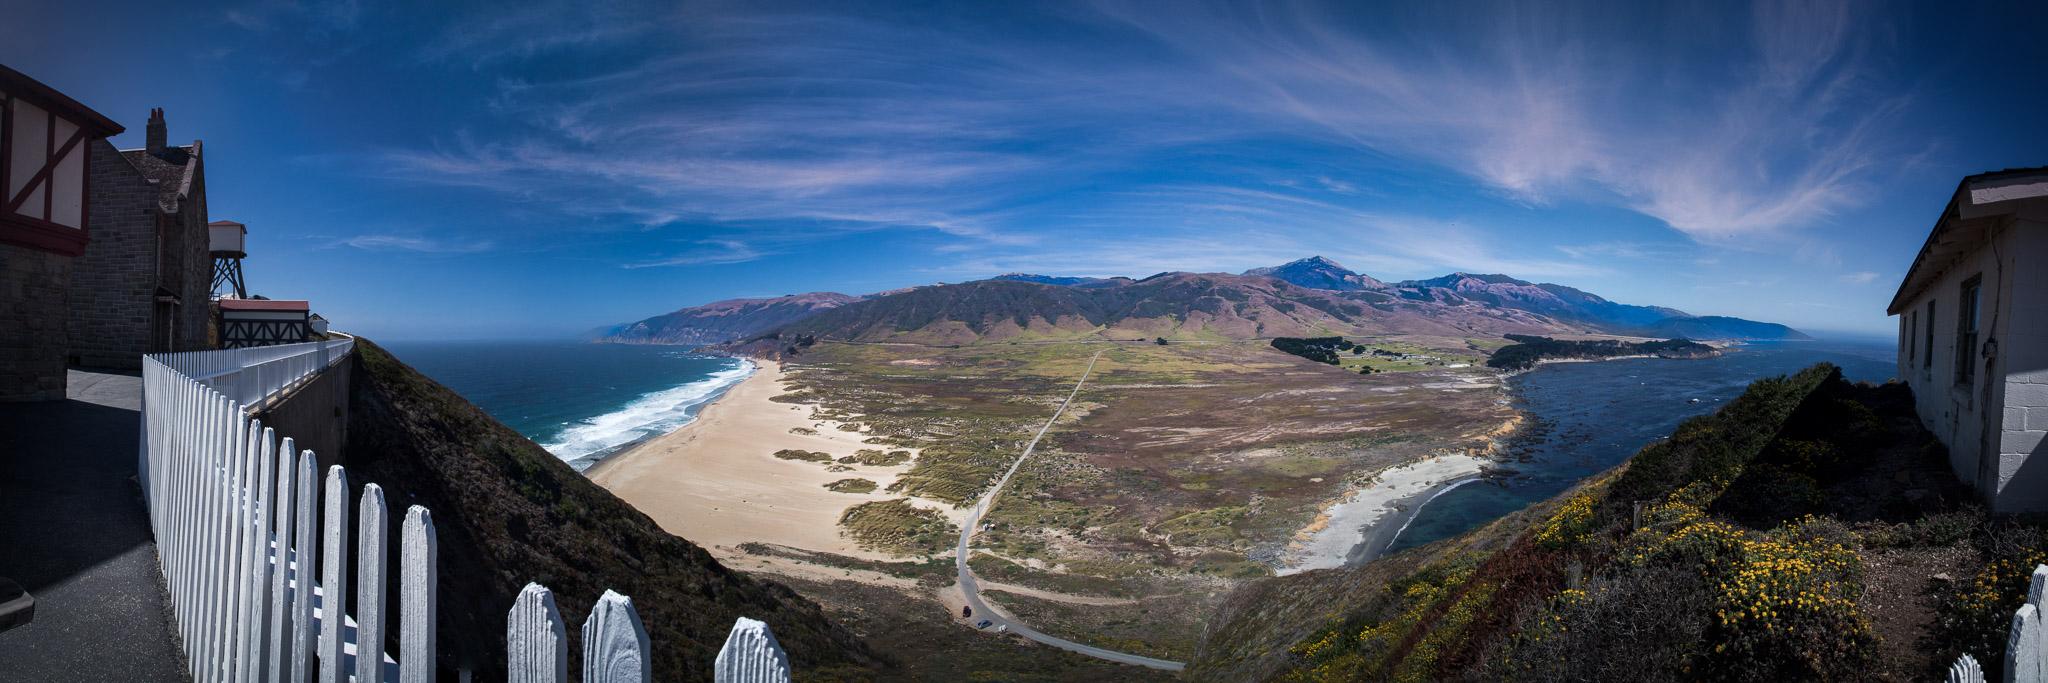 Point Sur Panorama